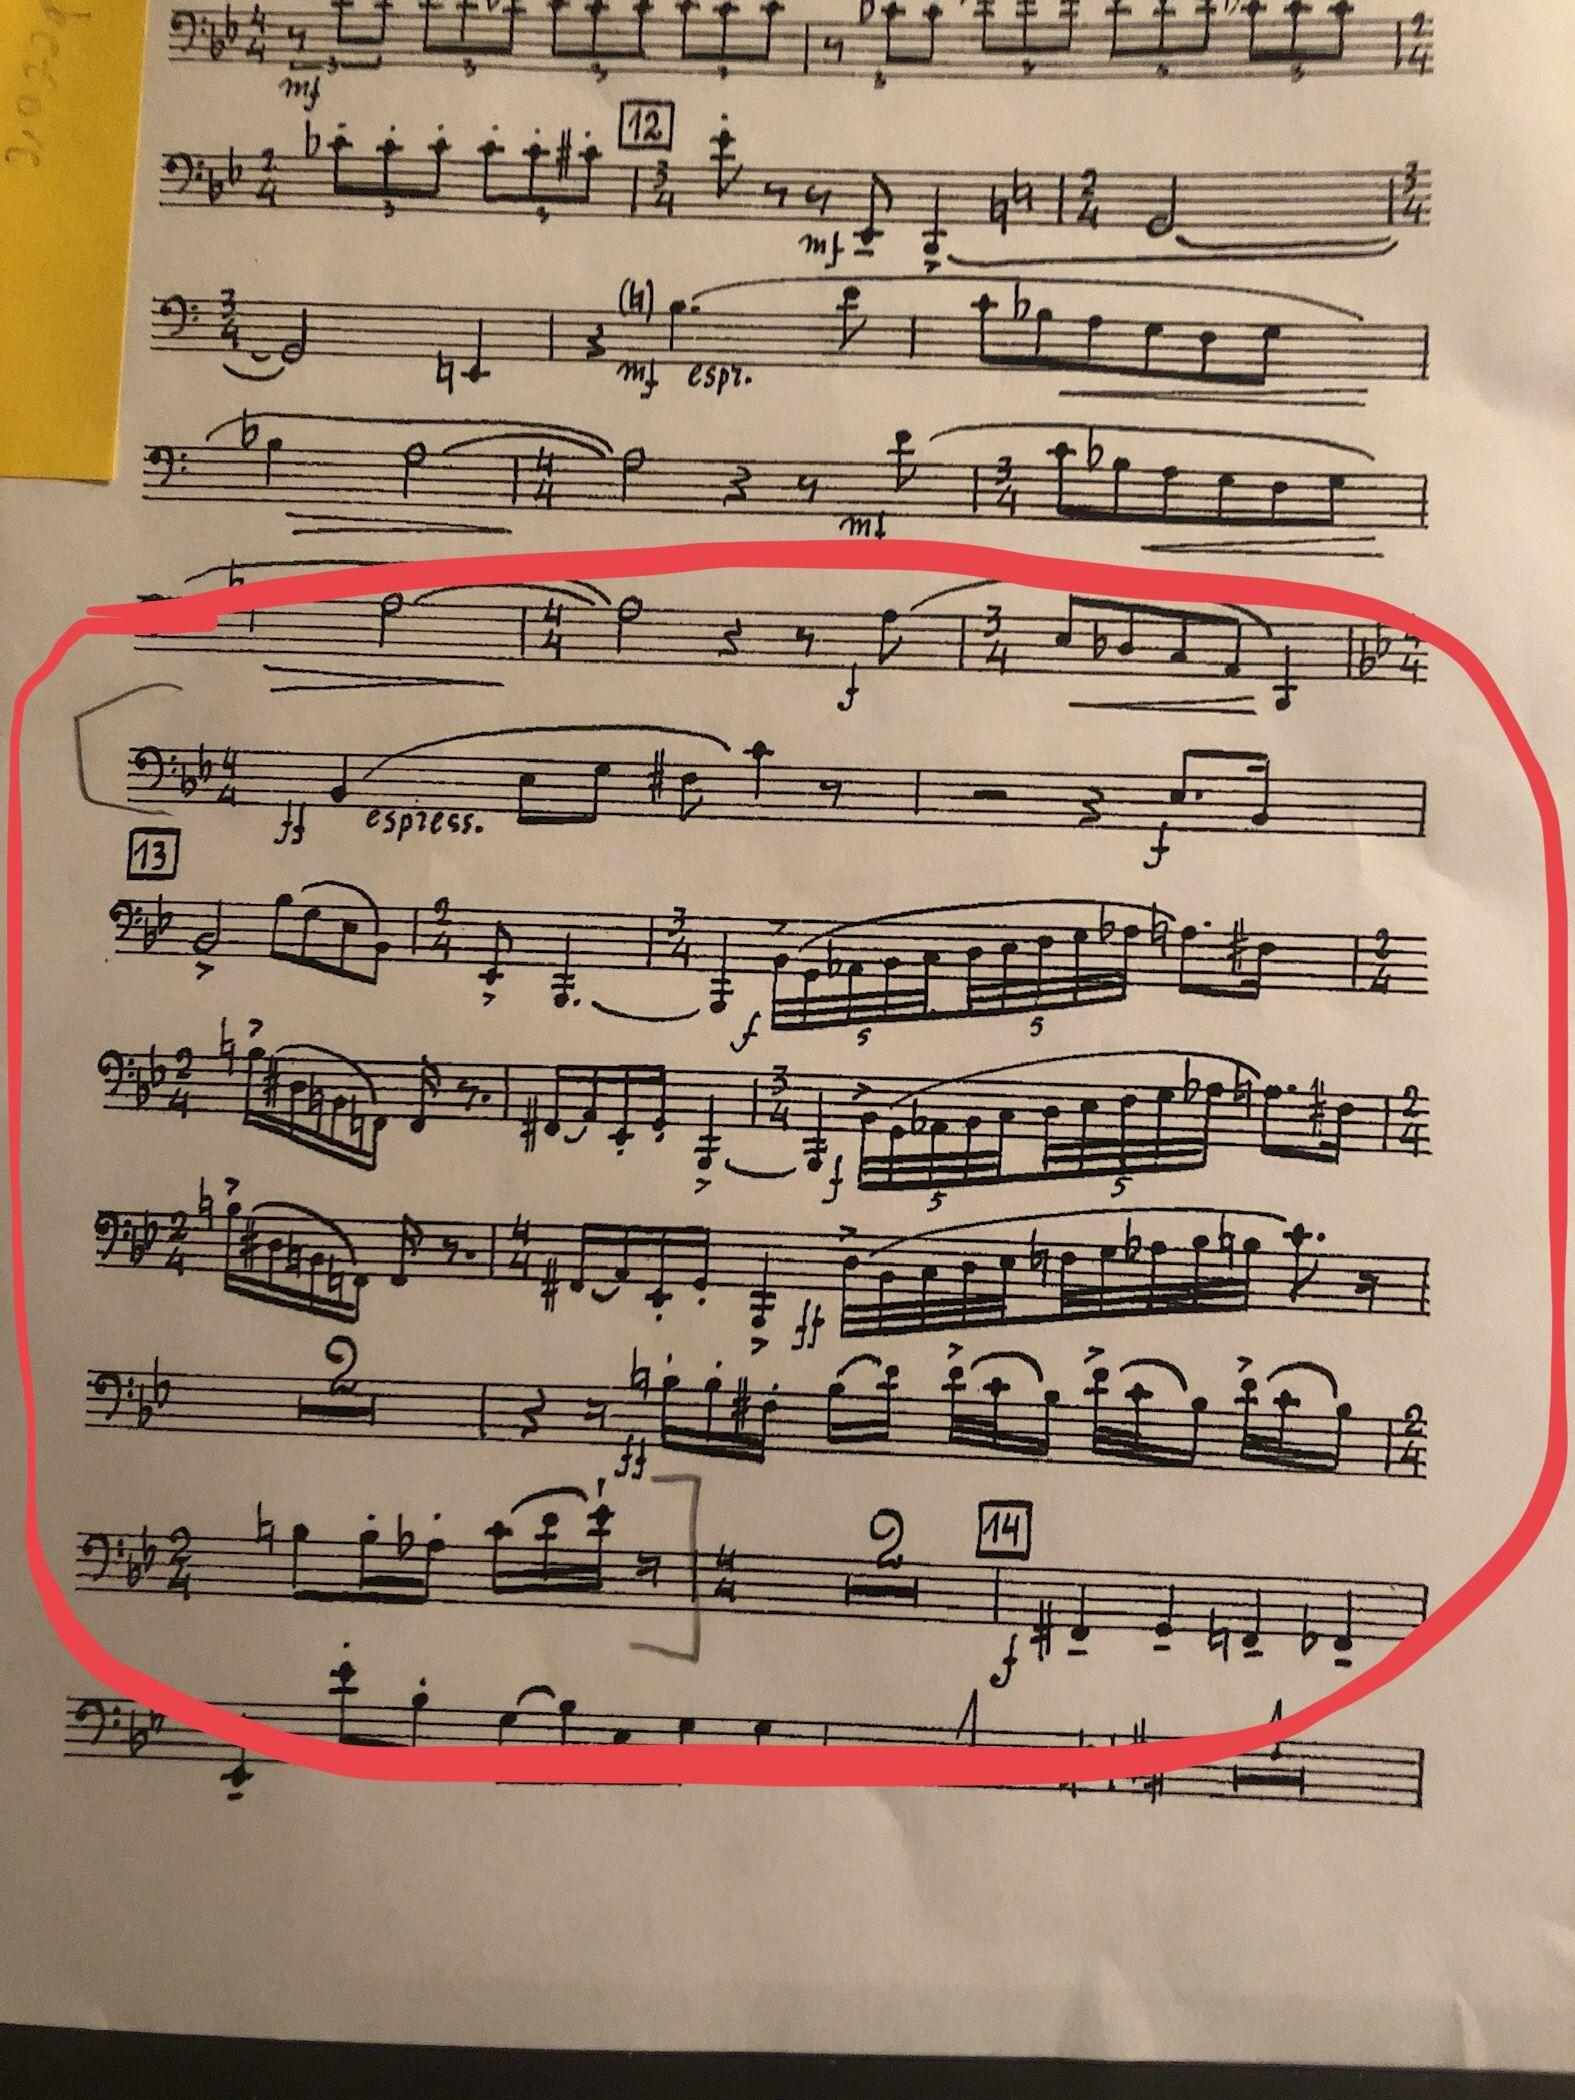 5Th Symphony prokofiev's 5th symphony-bassoon excerpt   bassoon, sheet